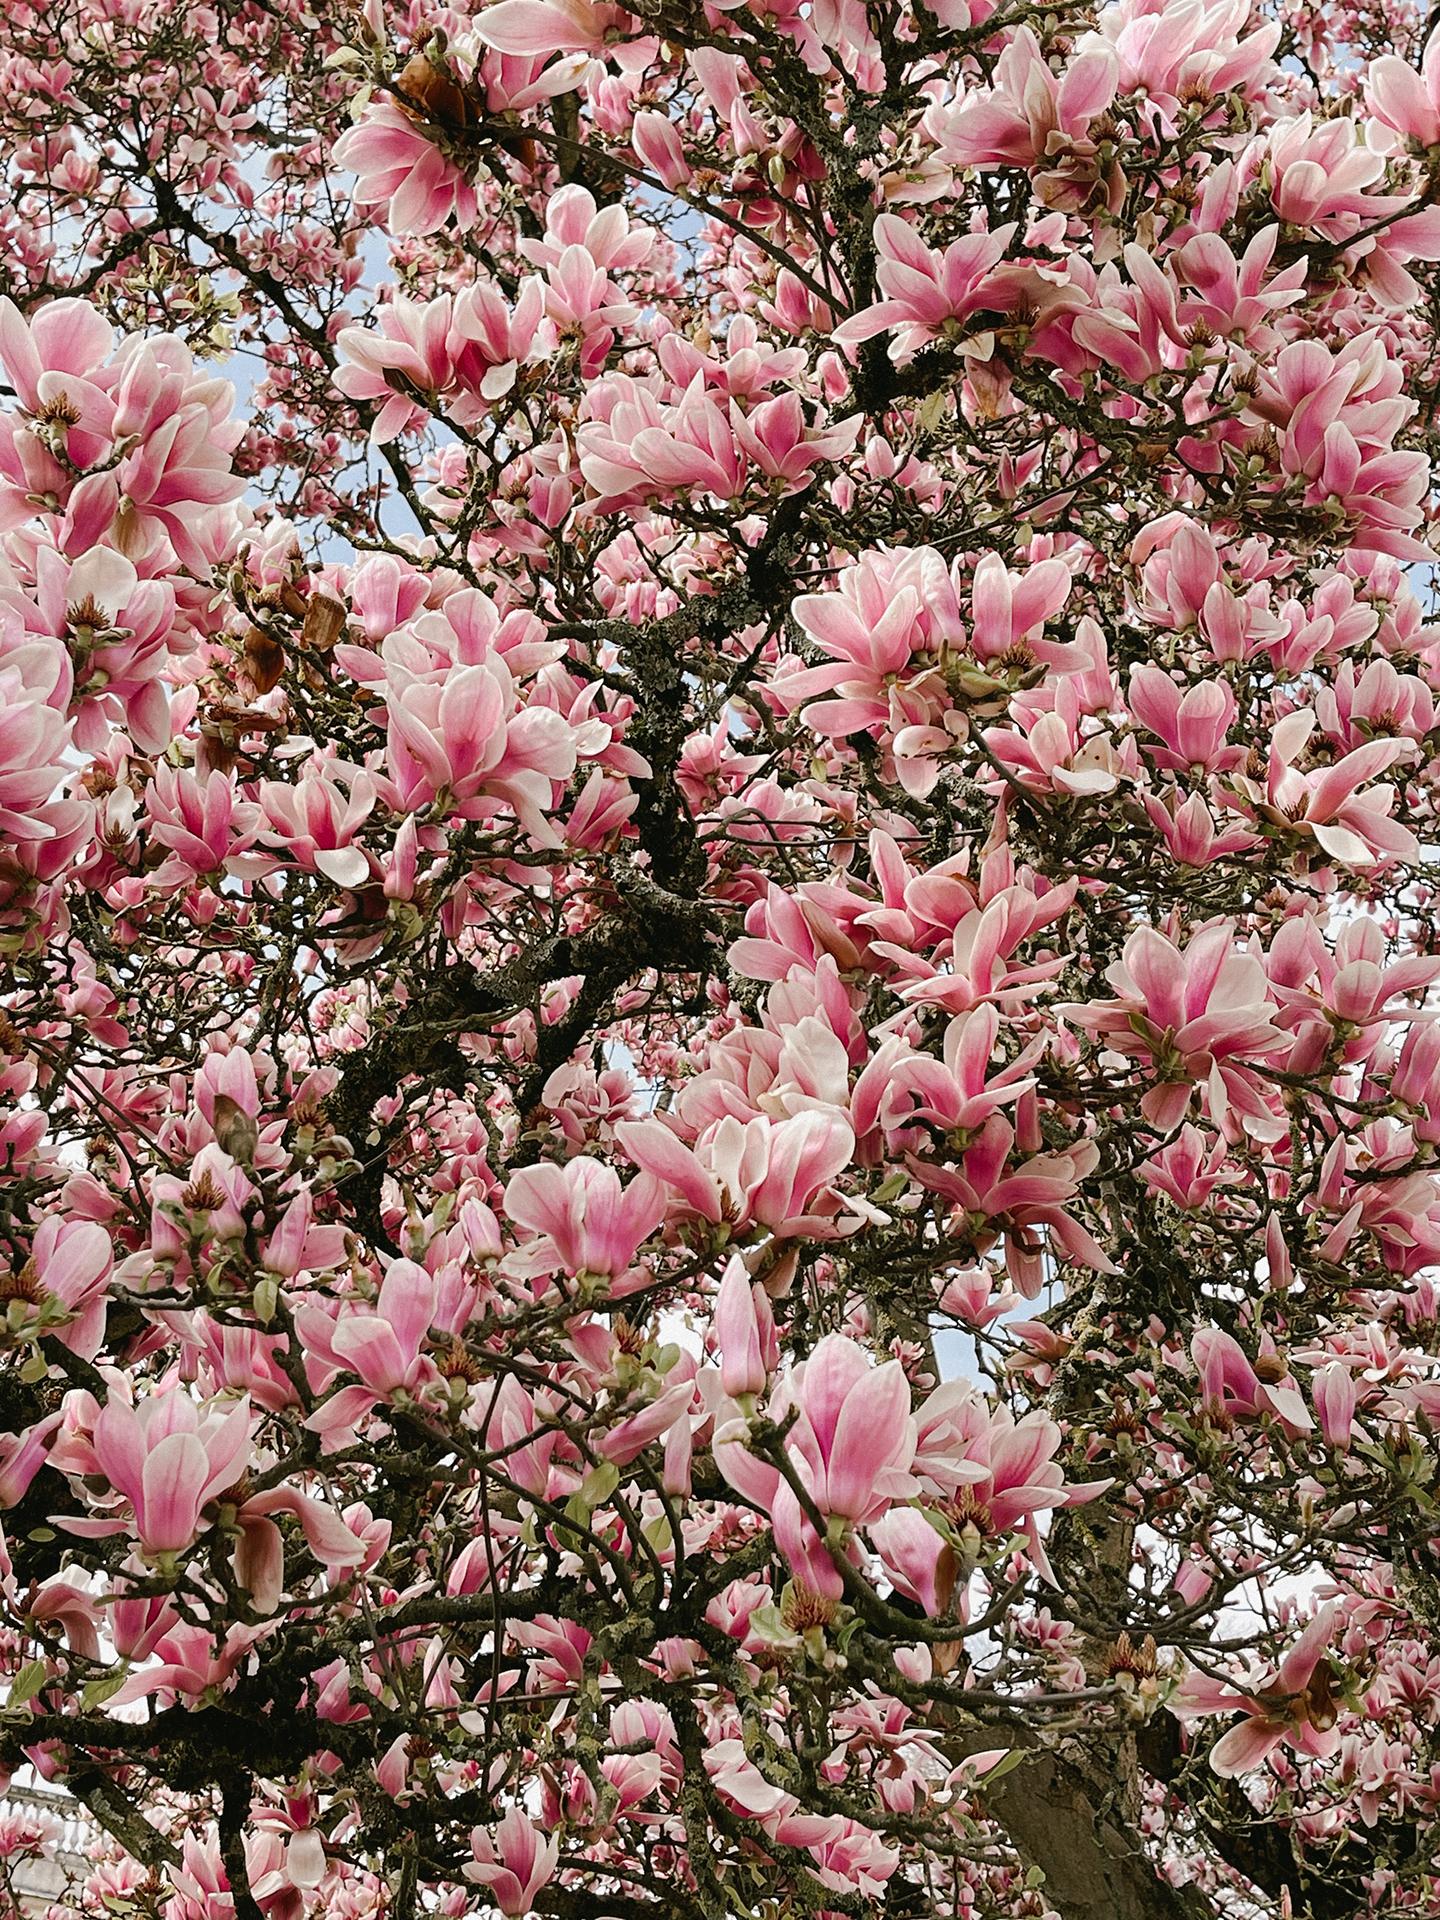 magnolia-jardin-public-bordeaux